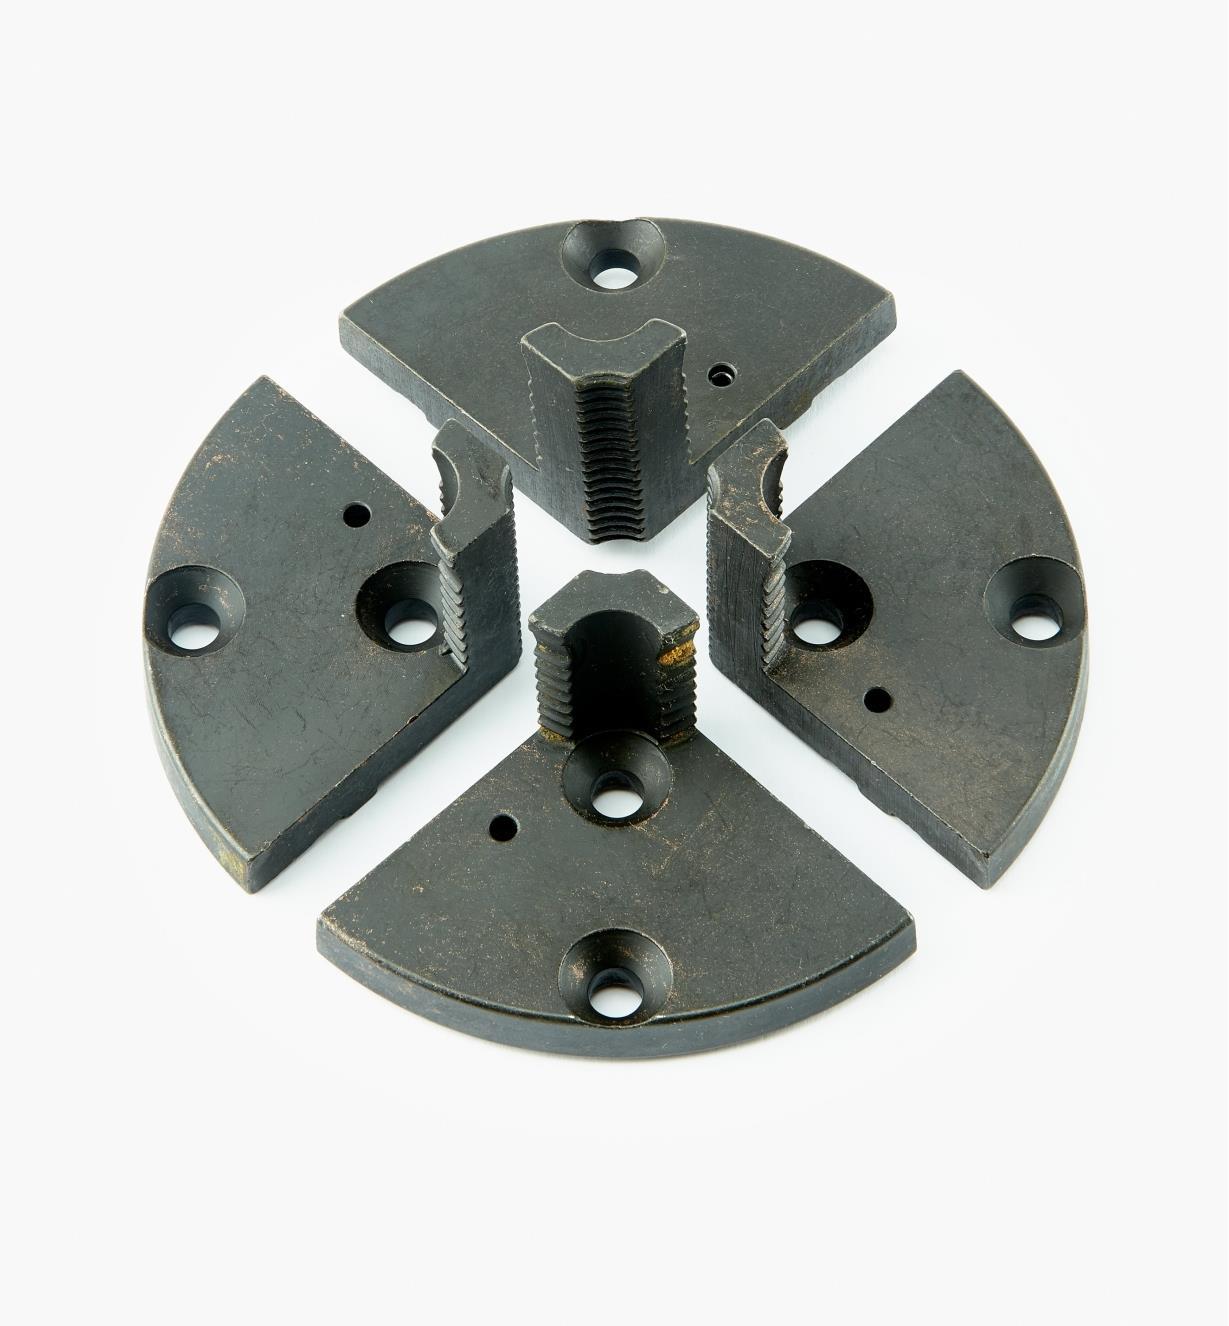 66B1301 - #1 Standard Spigot Stronghold Jaw Set